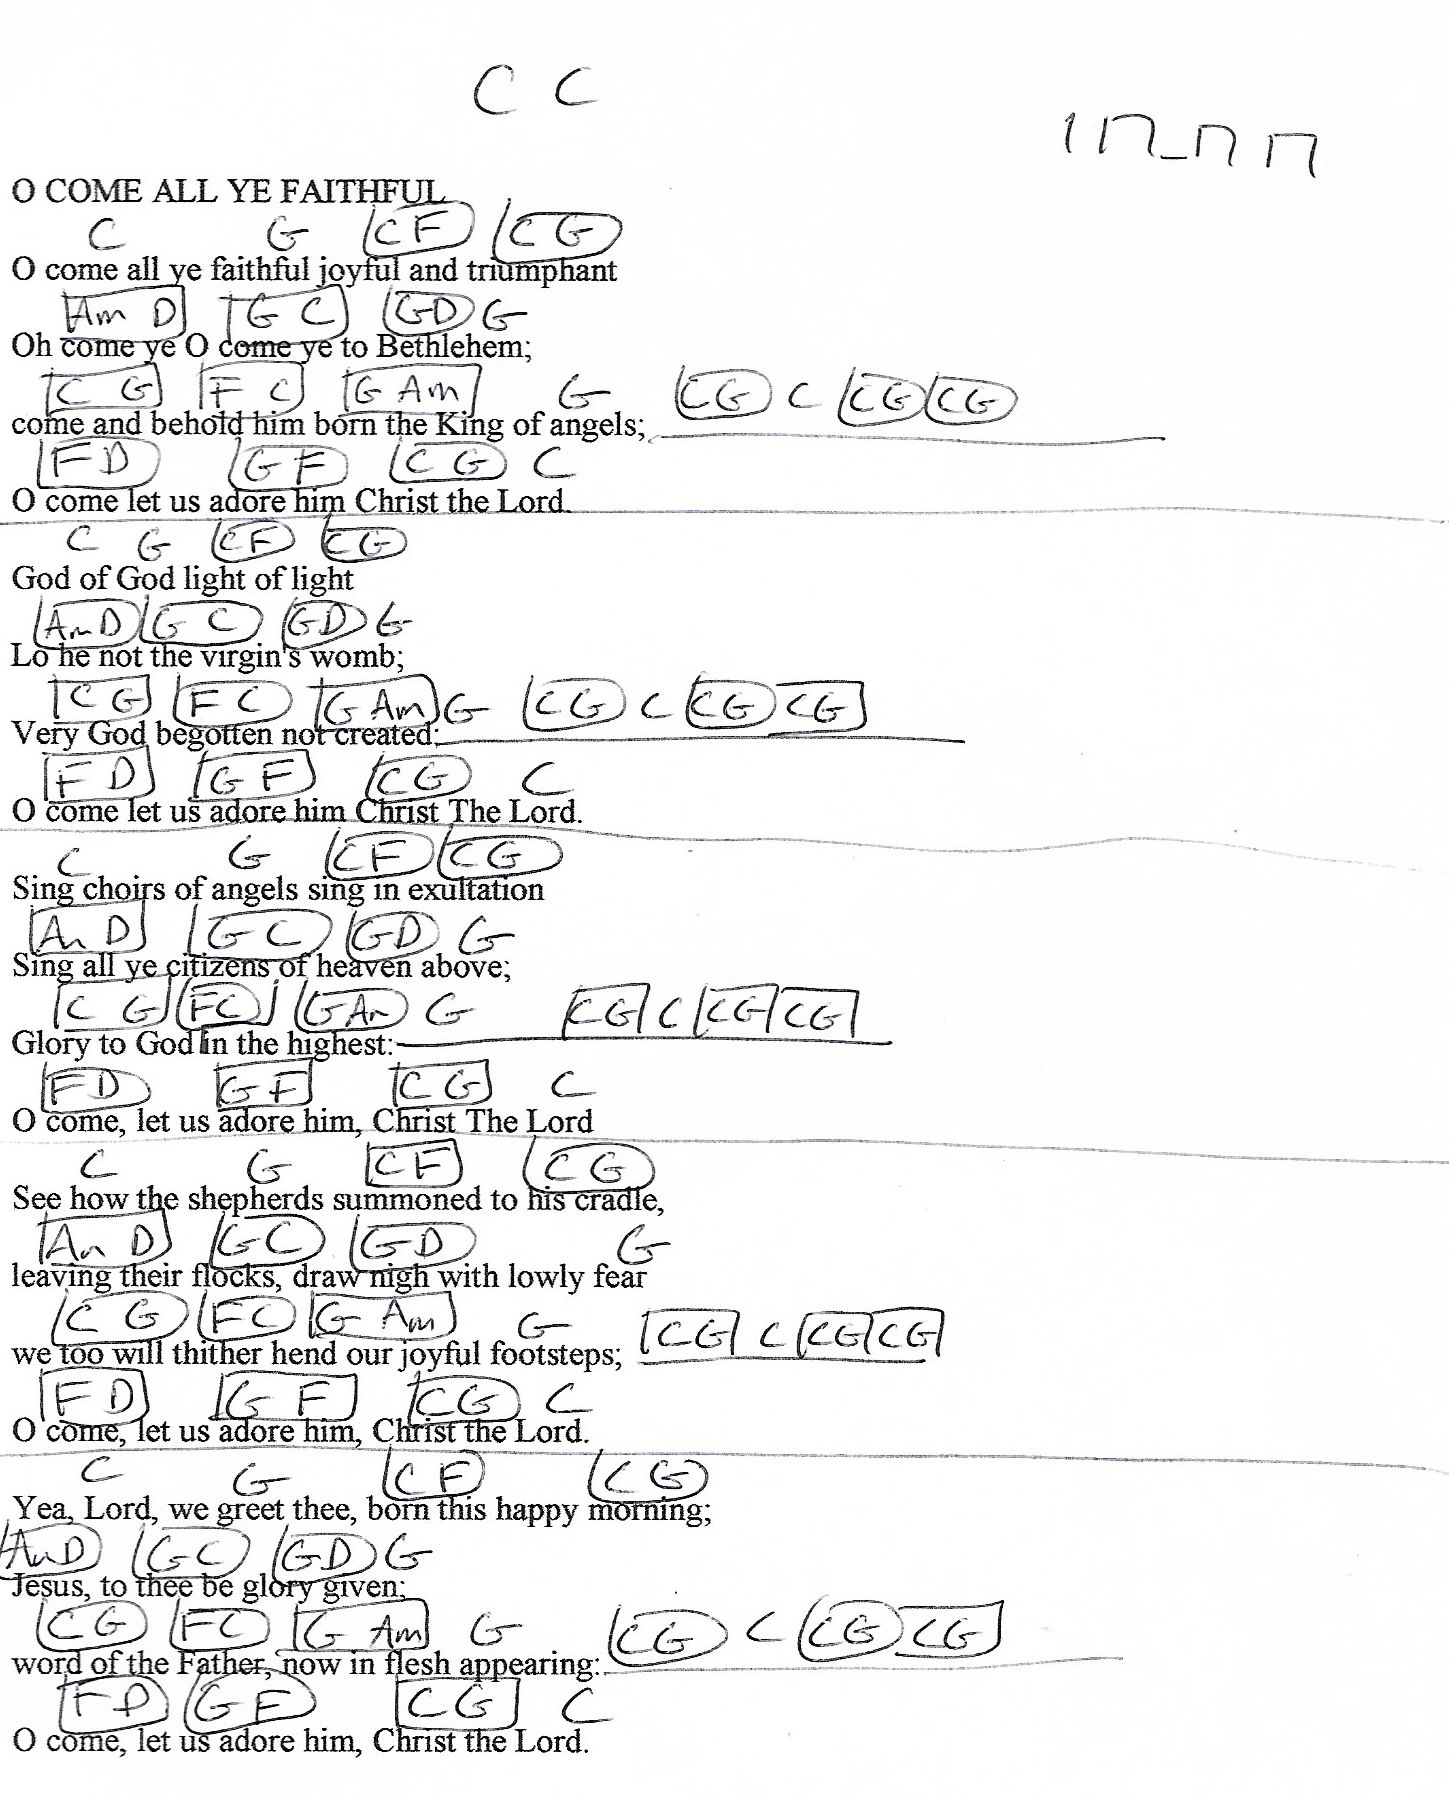 o come all ye faithful lyrics pdf